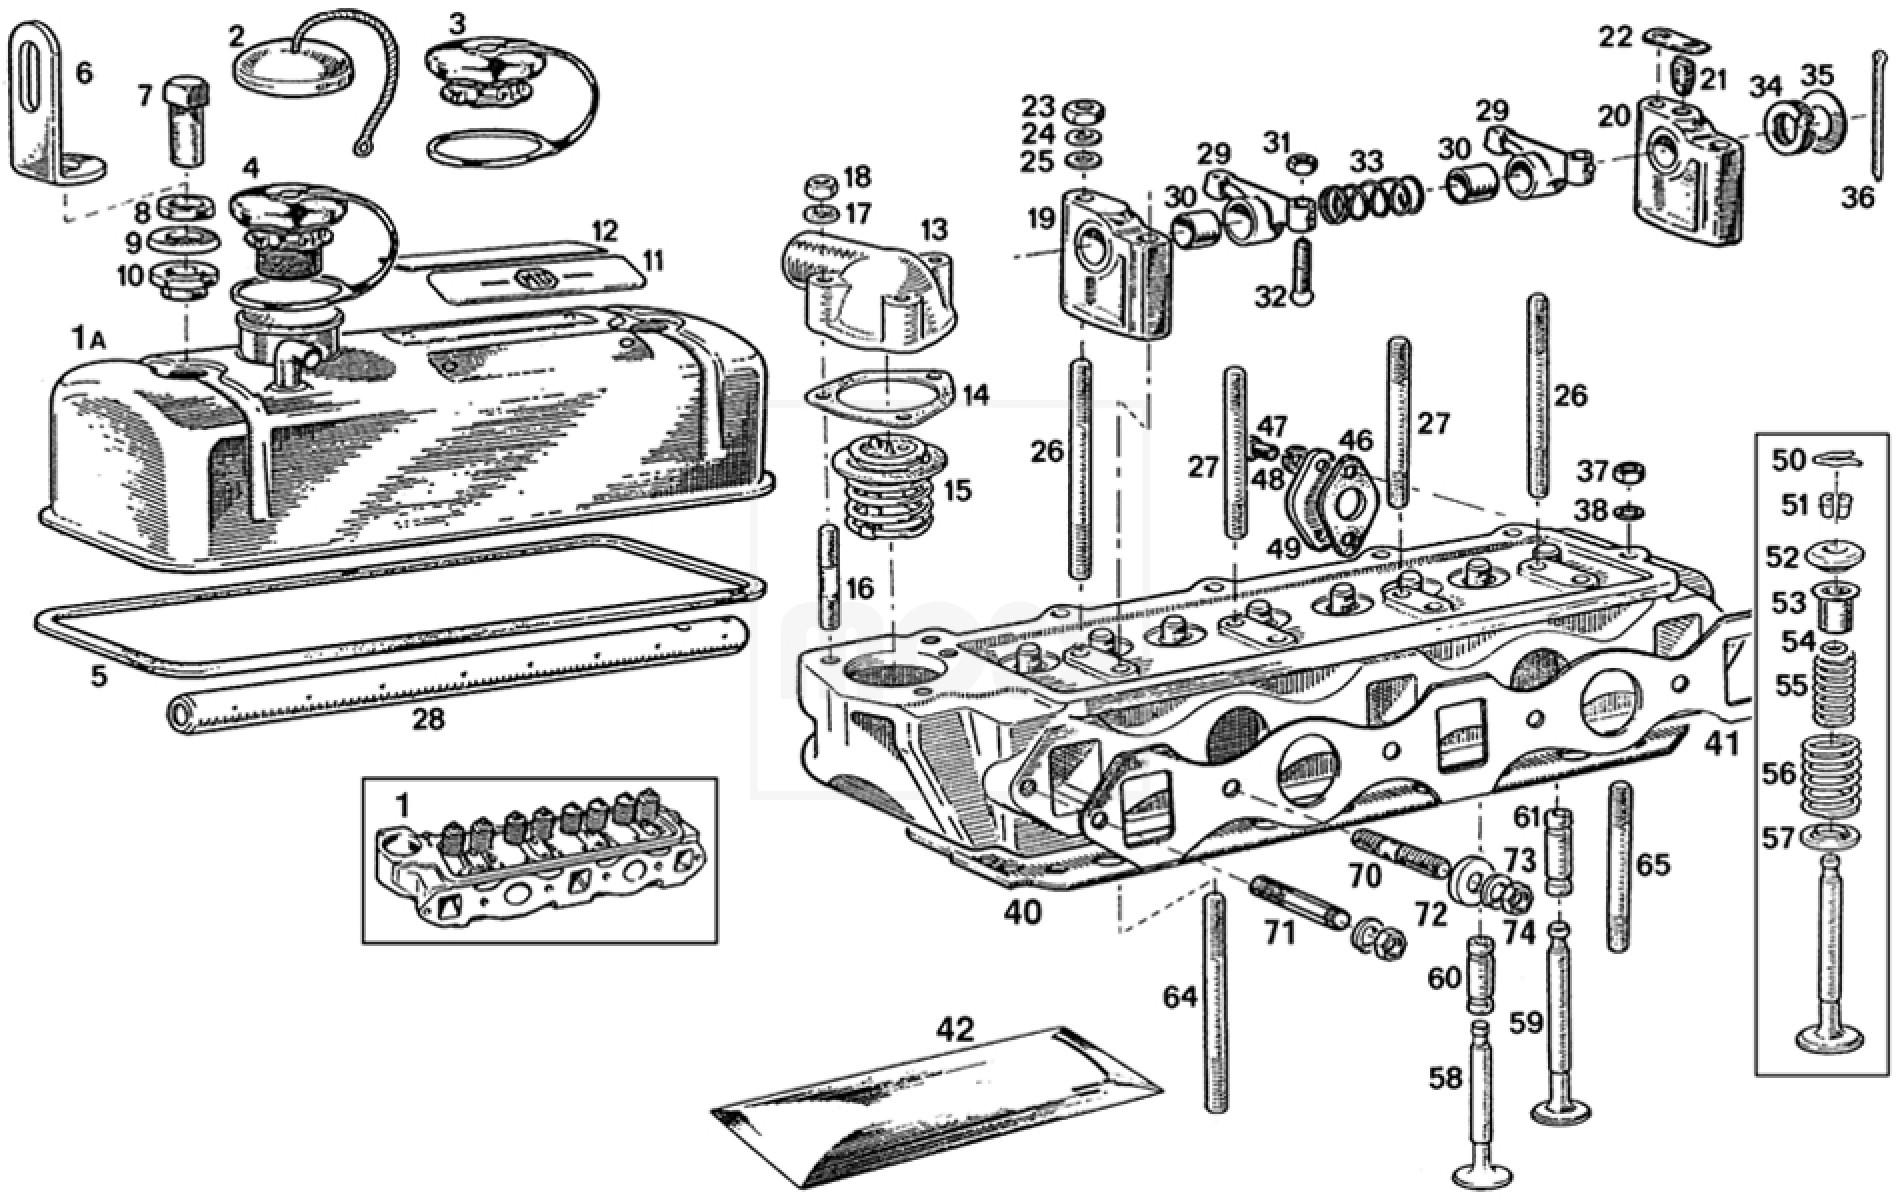 Cylinder Head & Fittings: 3 Main Bearing (18G-GA)